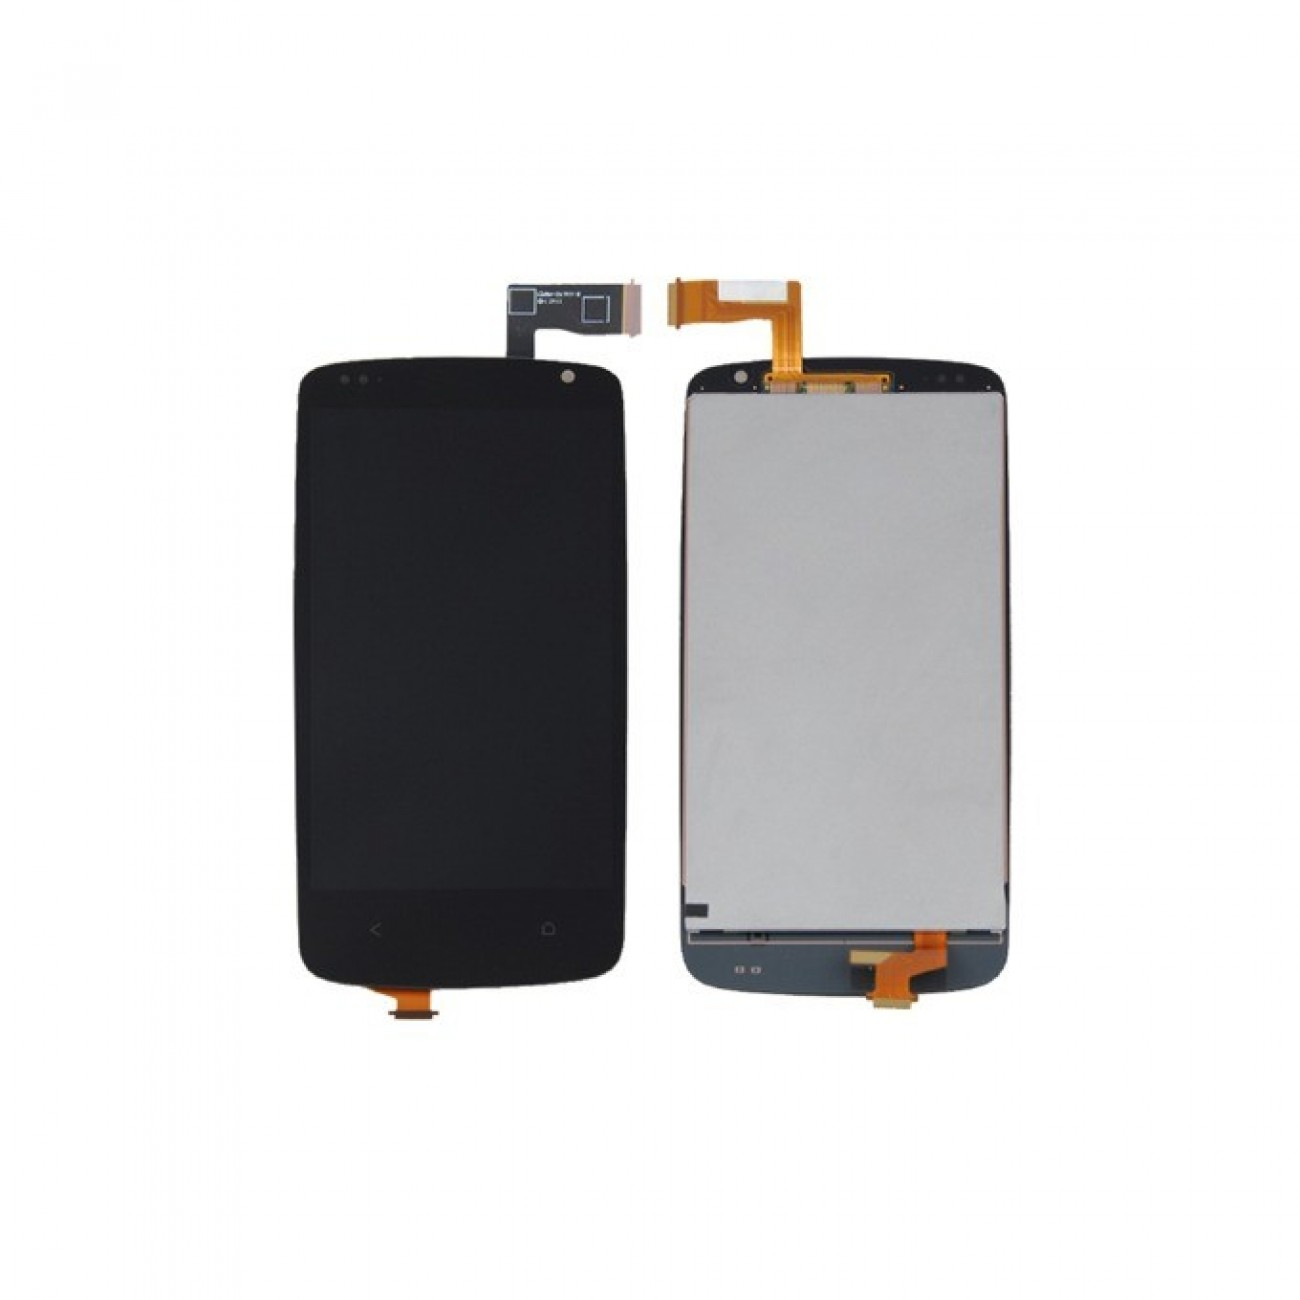 Дисплей за HTC Desire 500, LCD with touch в Резервни части -  | Alleop